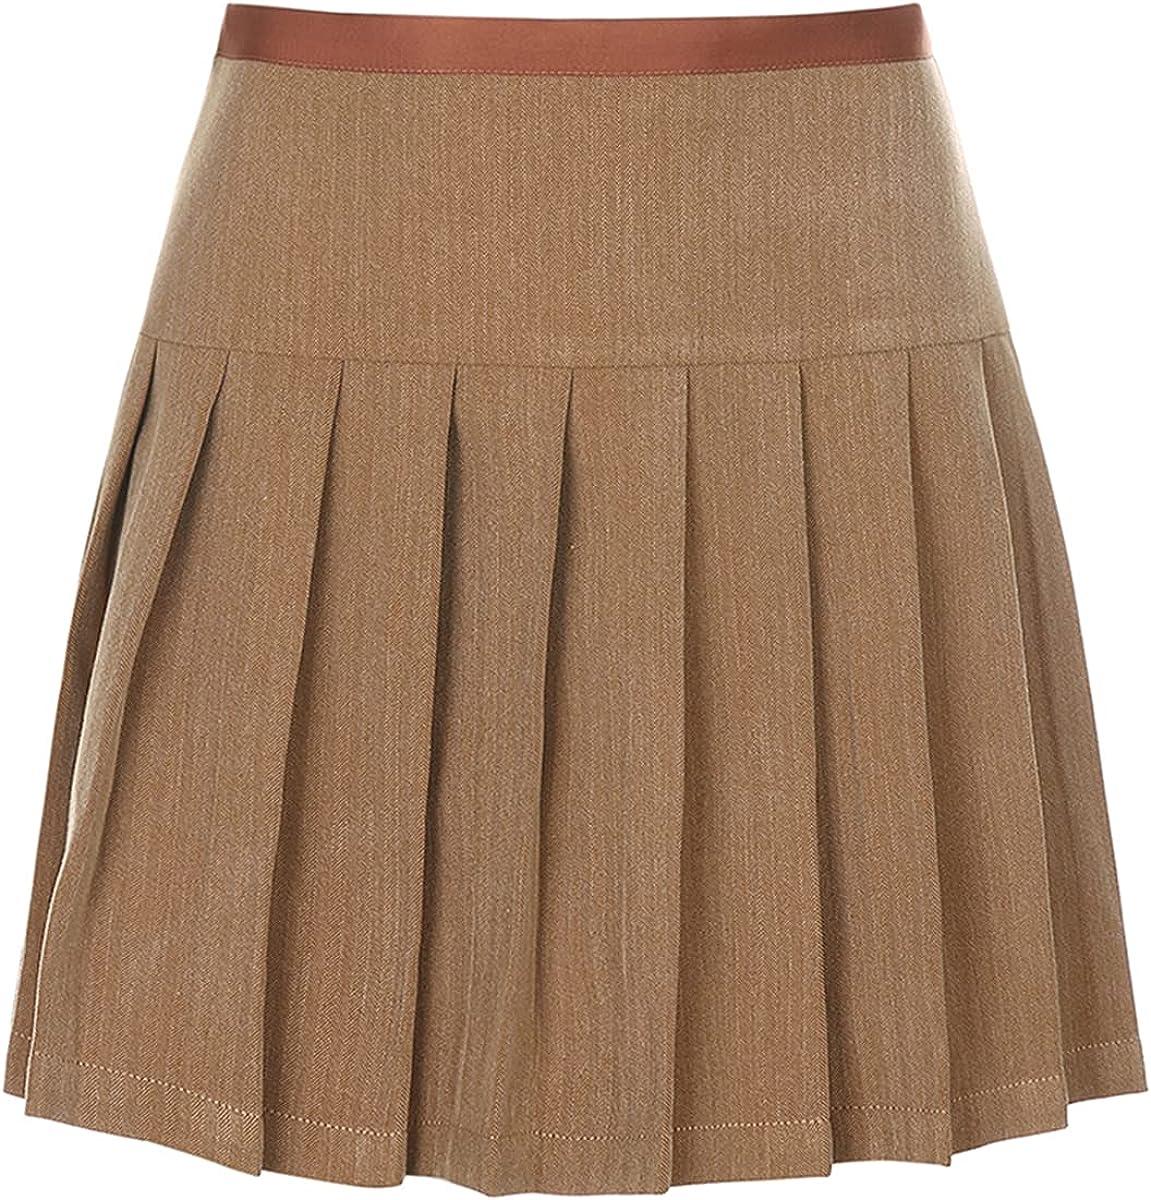 JNCJFS Khaki College Style Pleated Skirt Women's high Waist Mini Skirt Casual tie Skirt